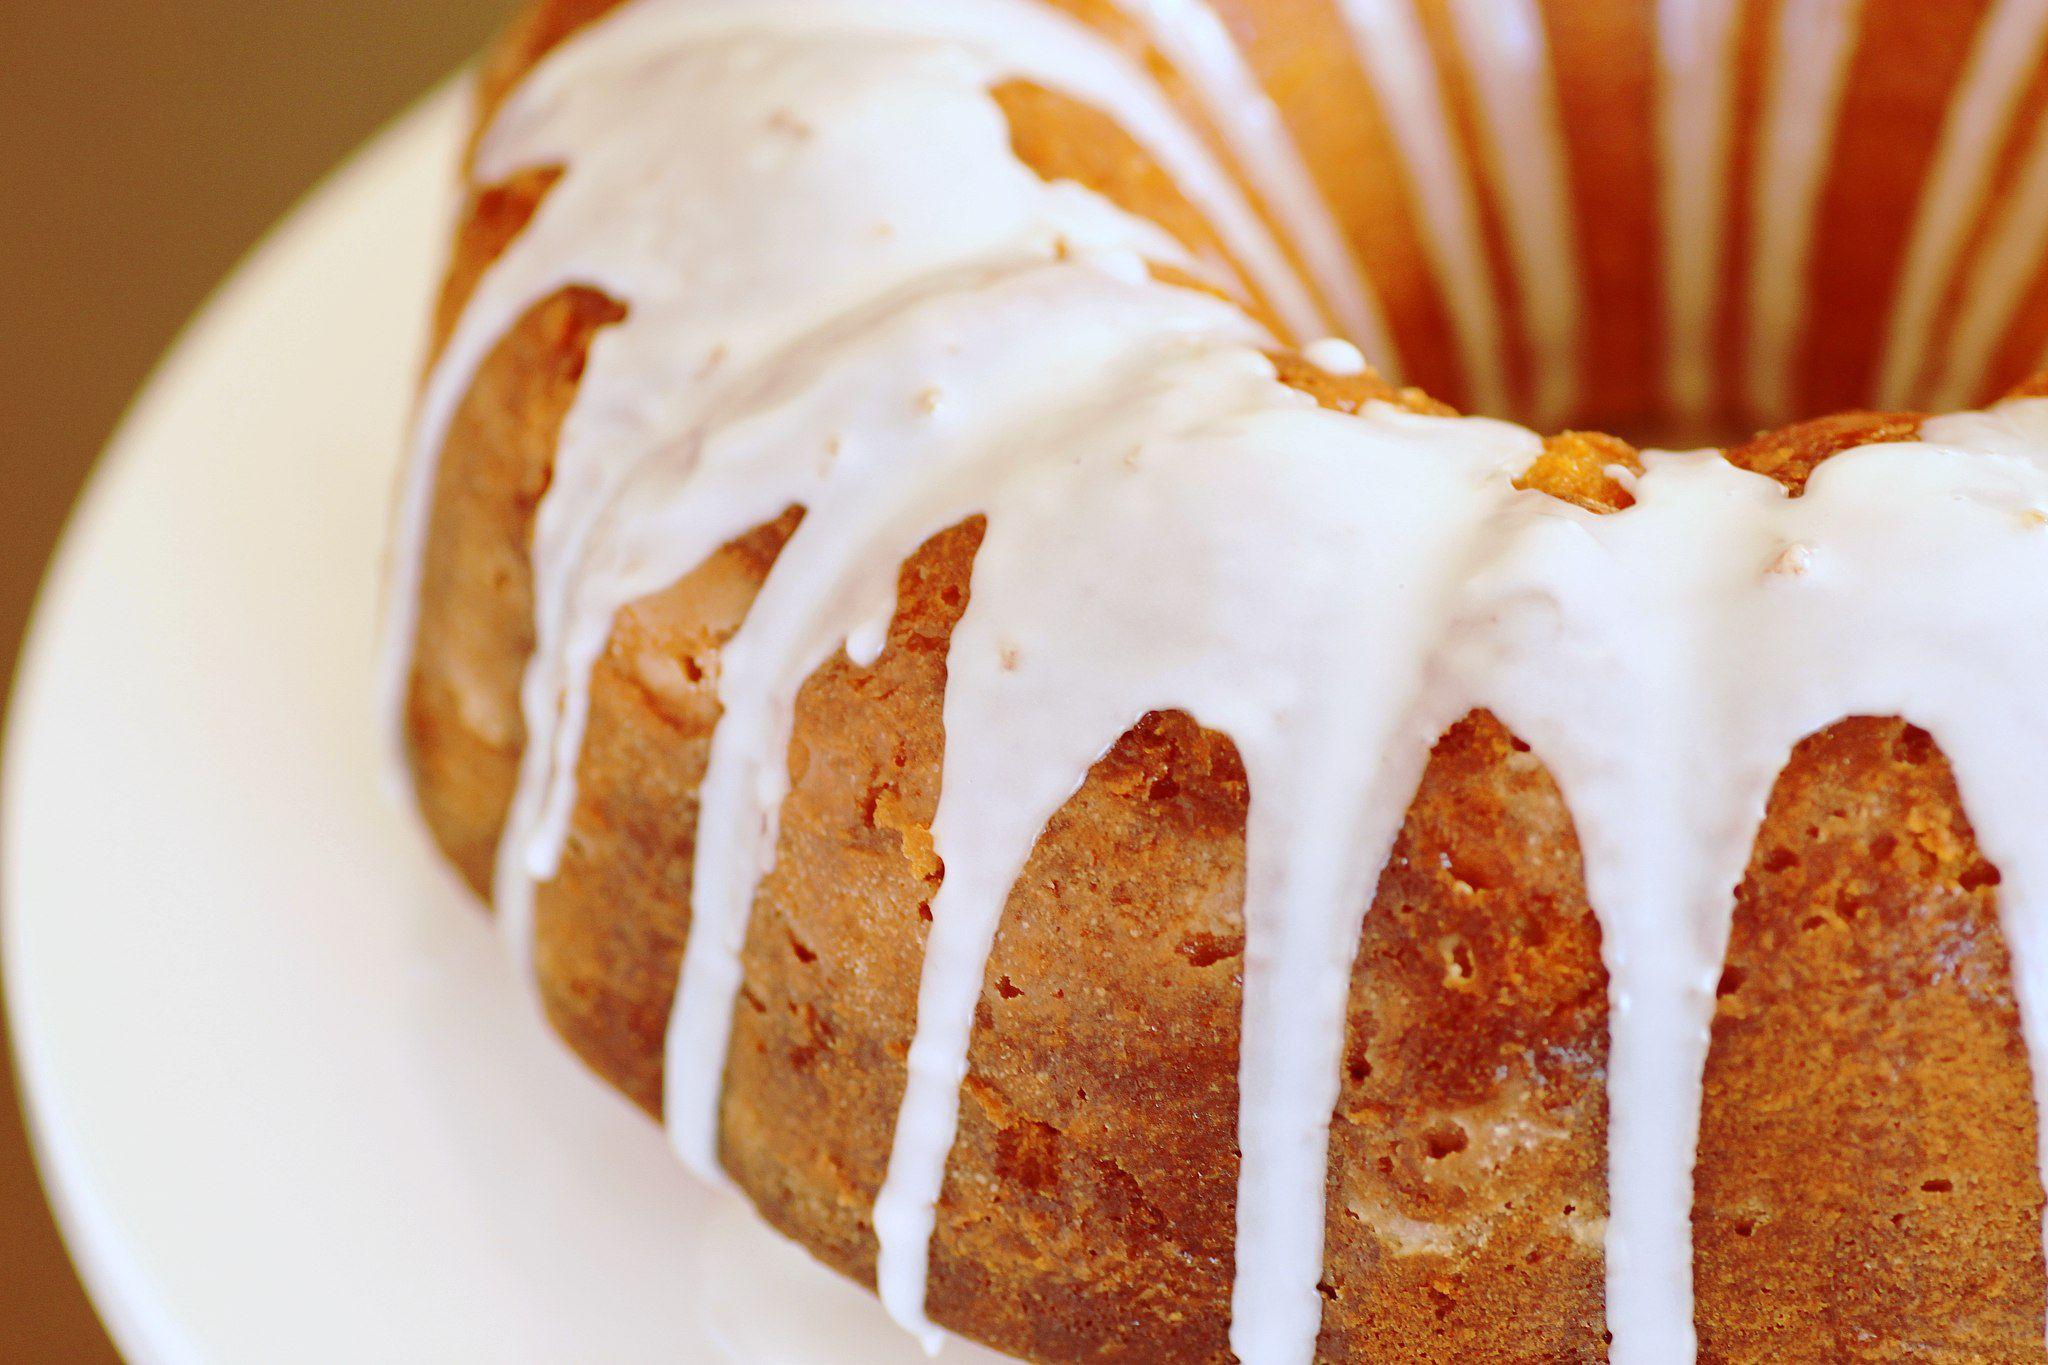 Easy 3 Ingredient Lemon Glaze Recipe For Desserts